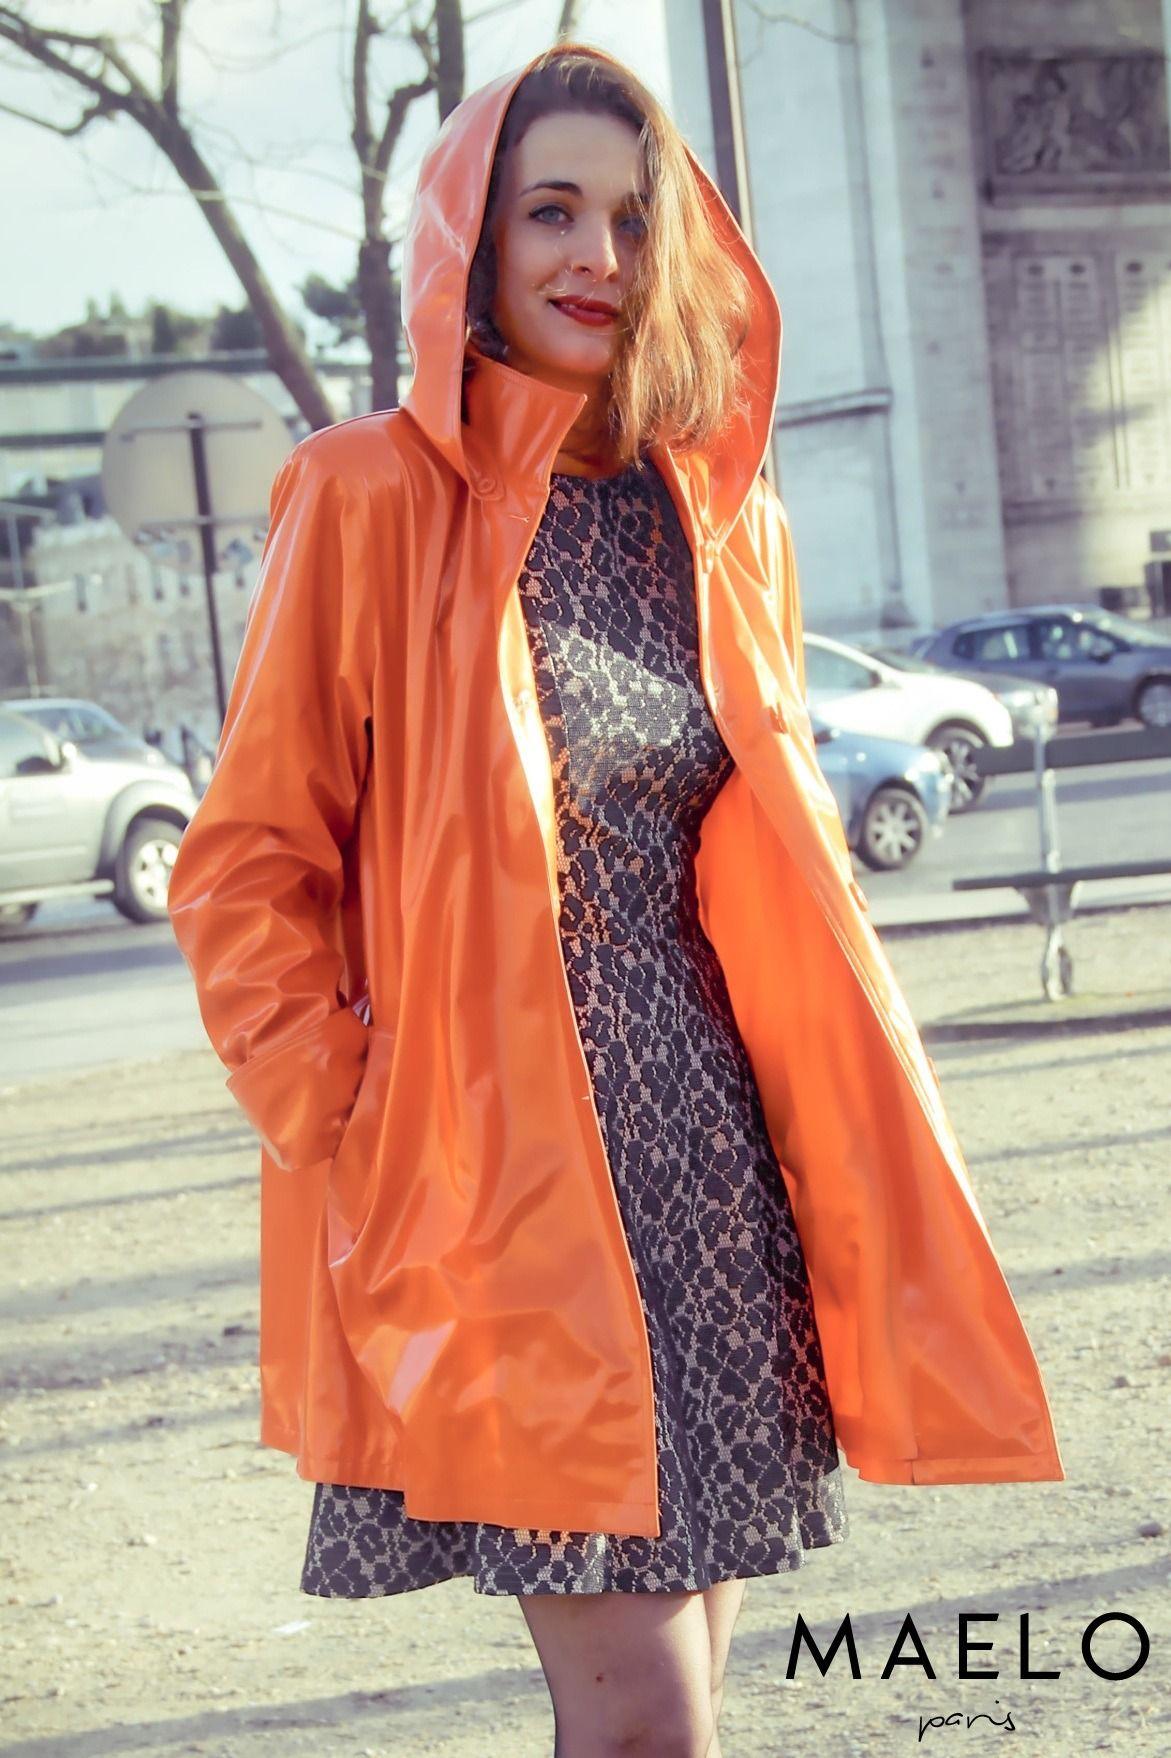 In 2019RegenmantelRegenjacke Maelo Raincoat Und Paris pSMzGqULV